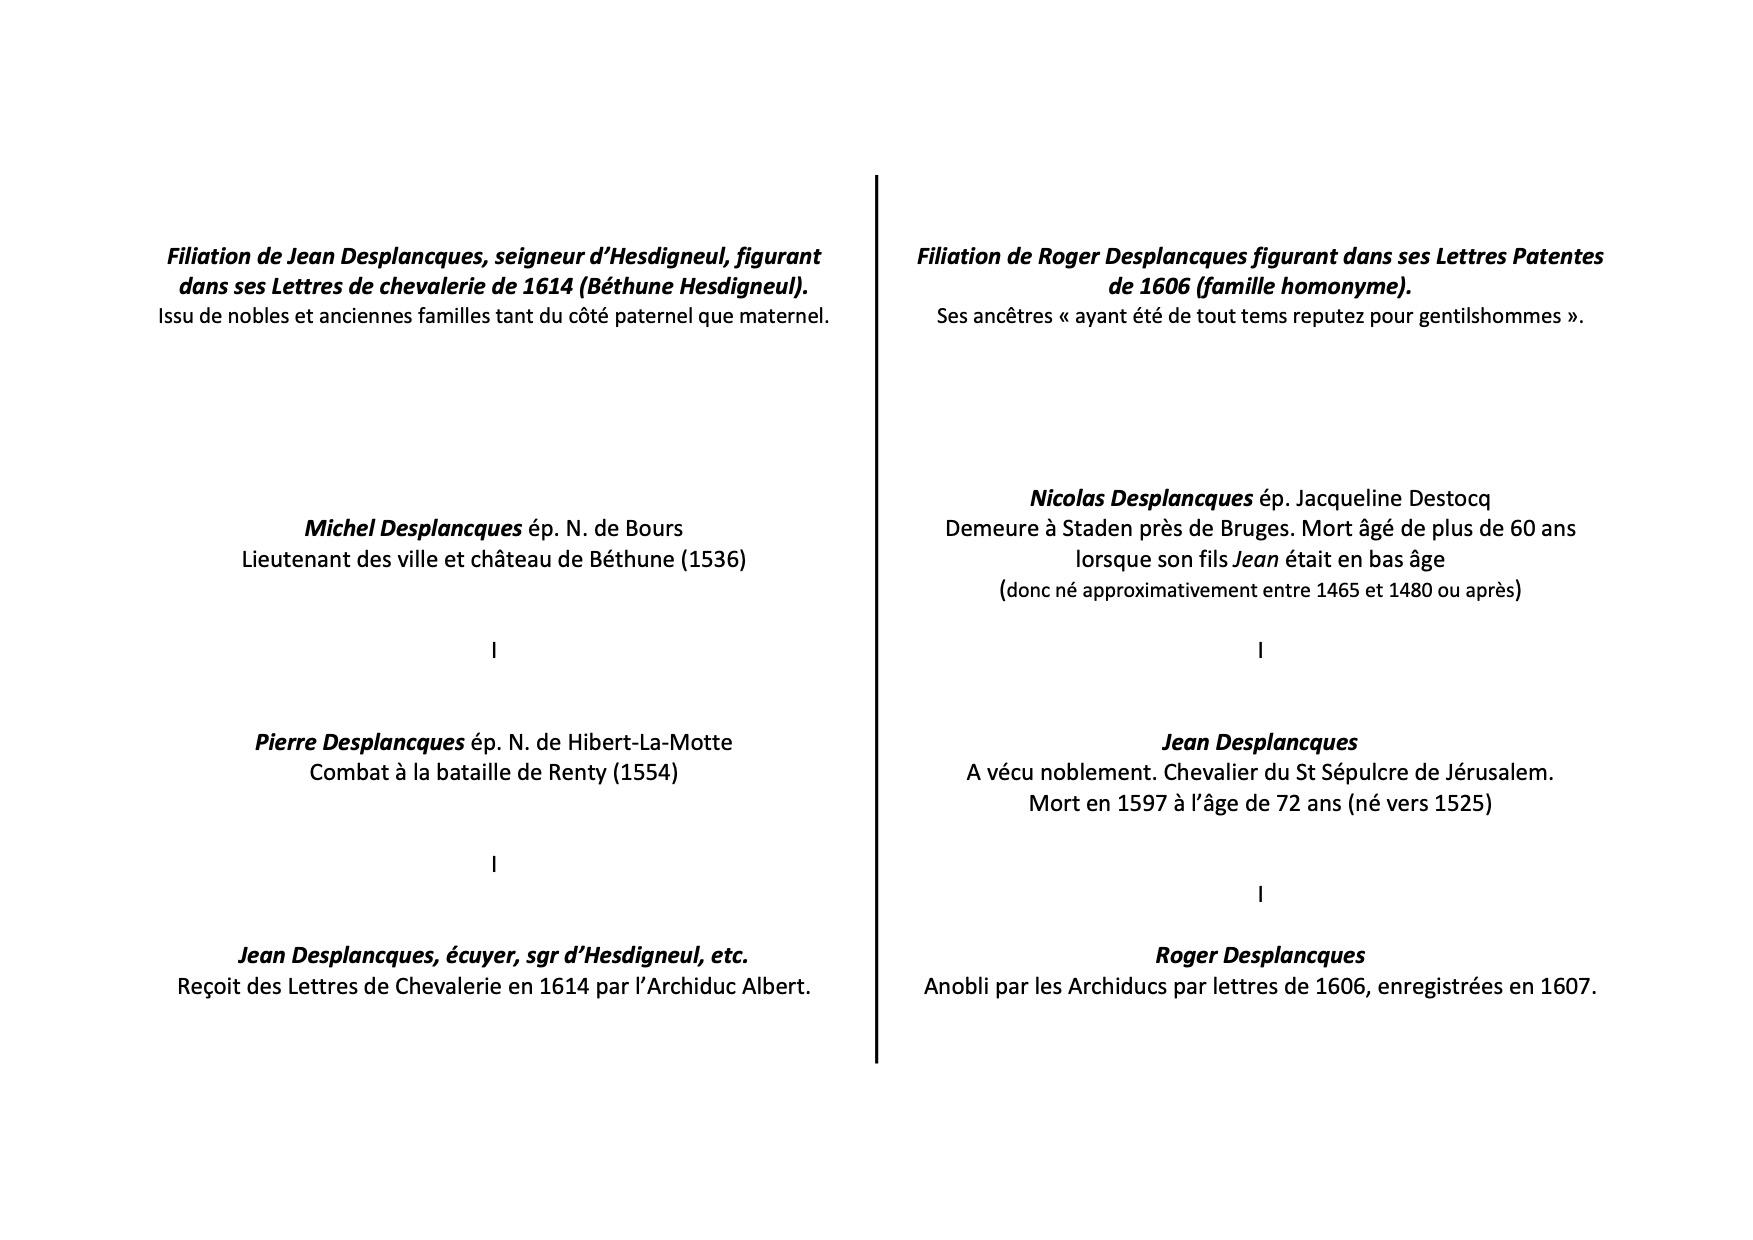 Filiations Roger Desplancques Jean Desplancques homonymie anoblissement béthune Hesdigneul 1606 1614